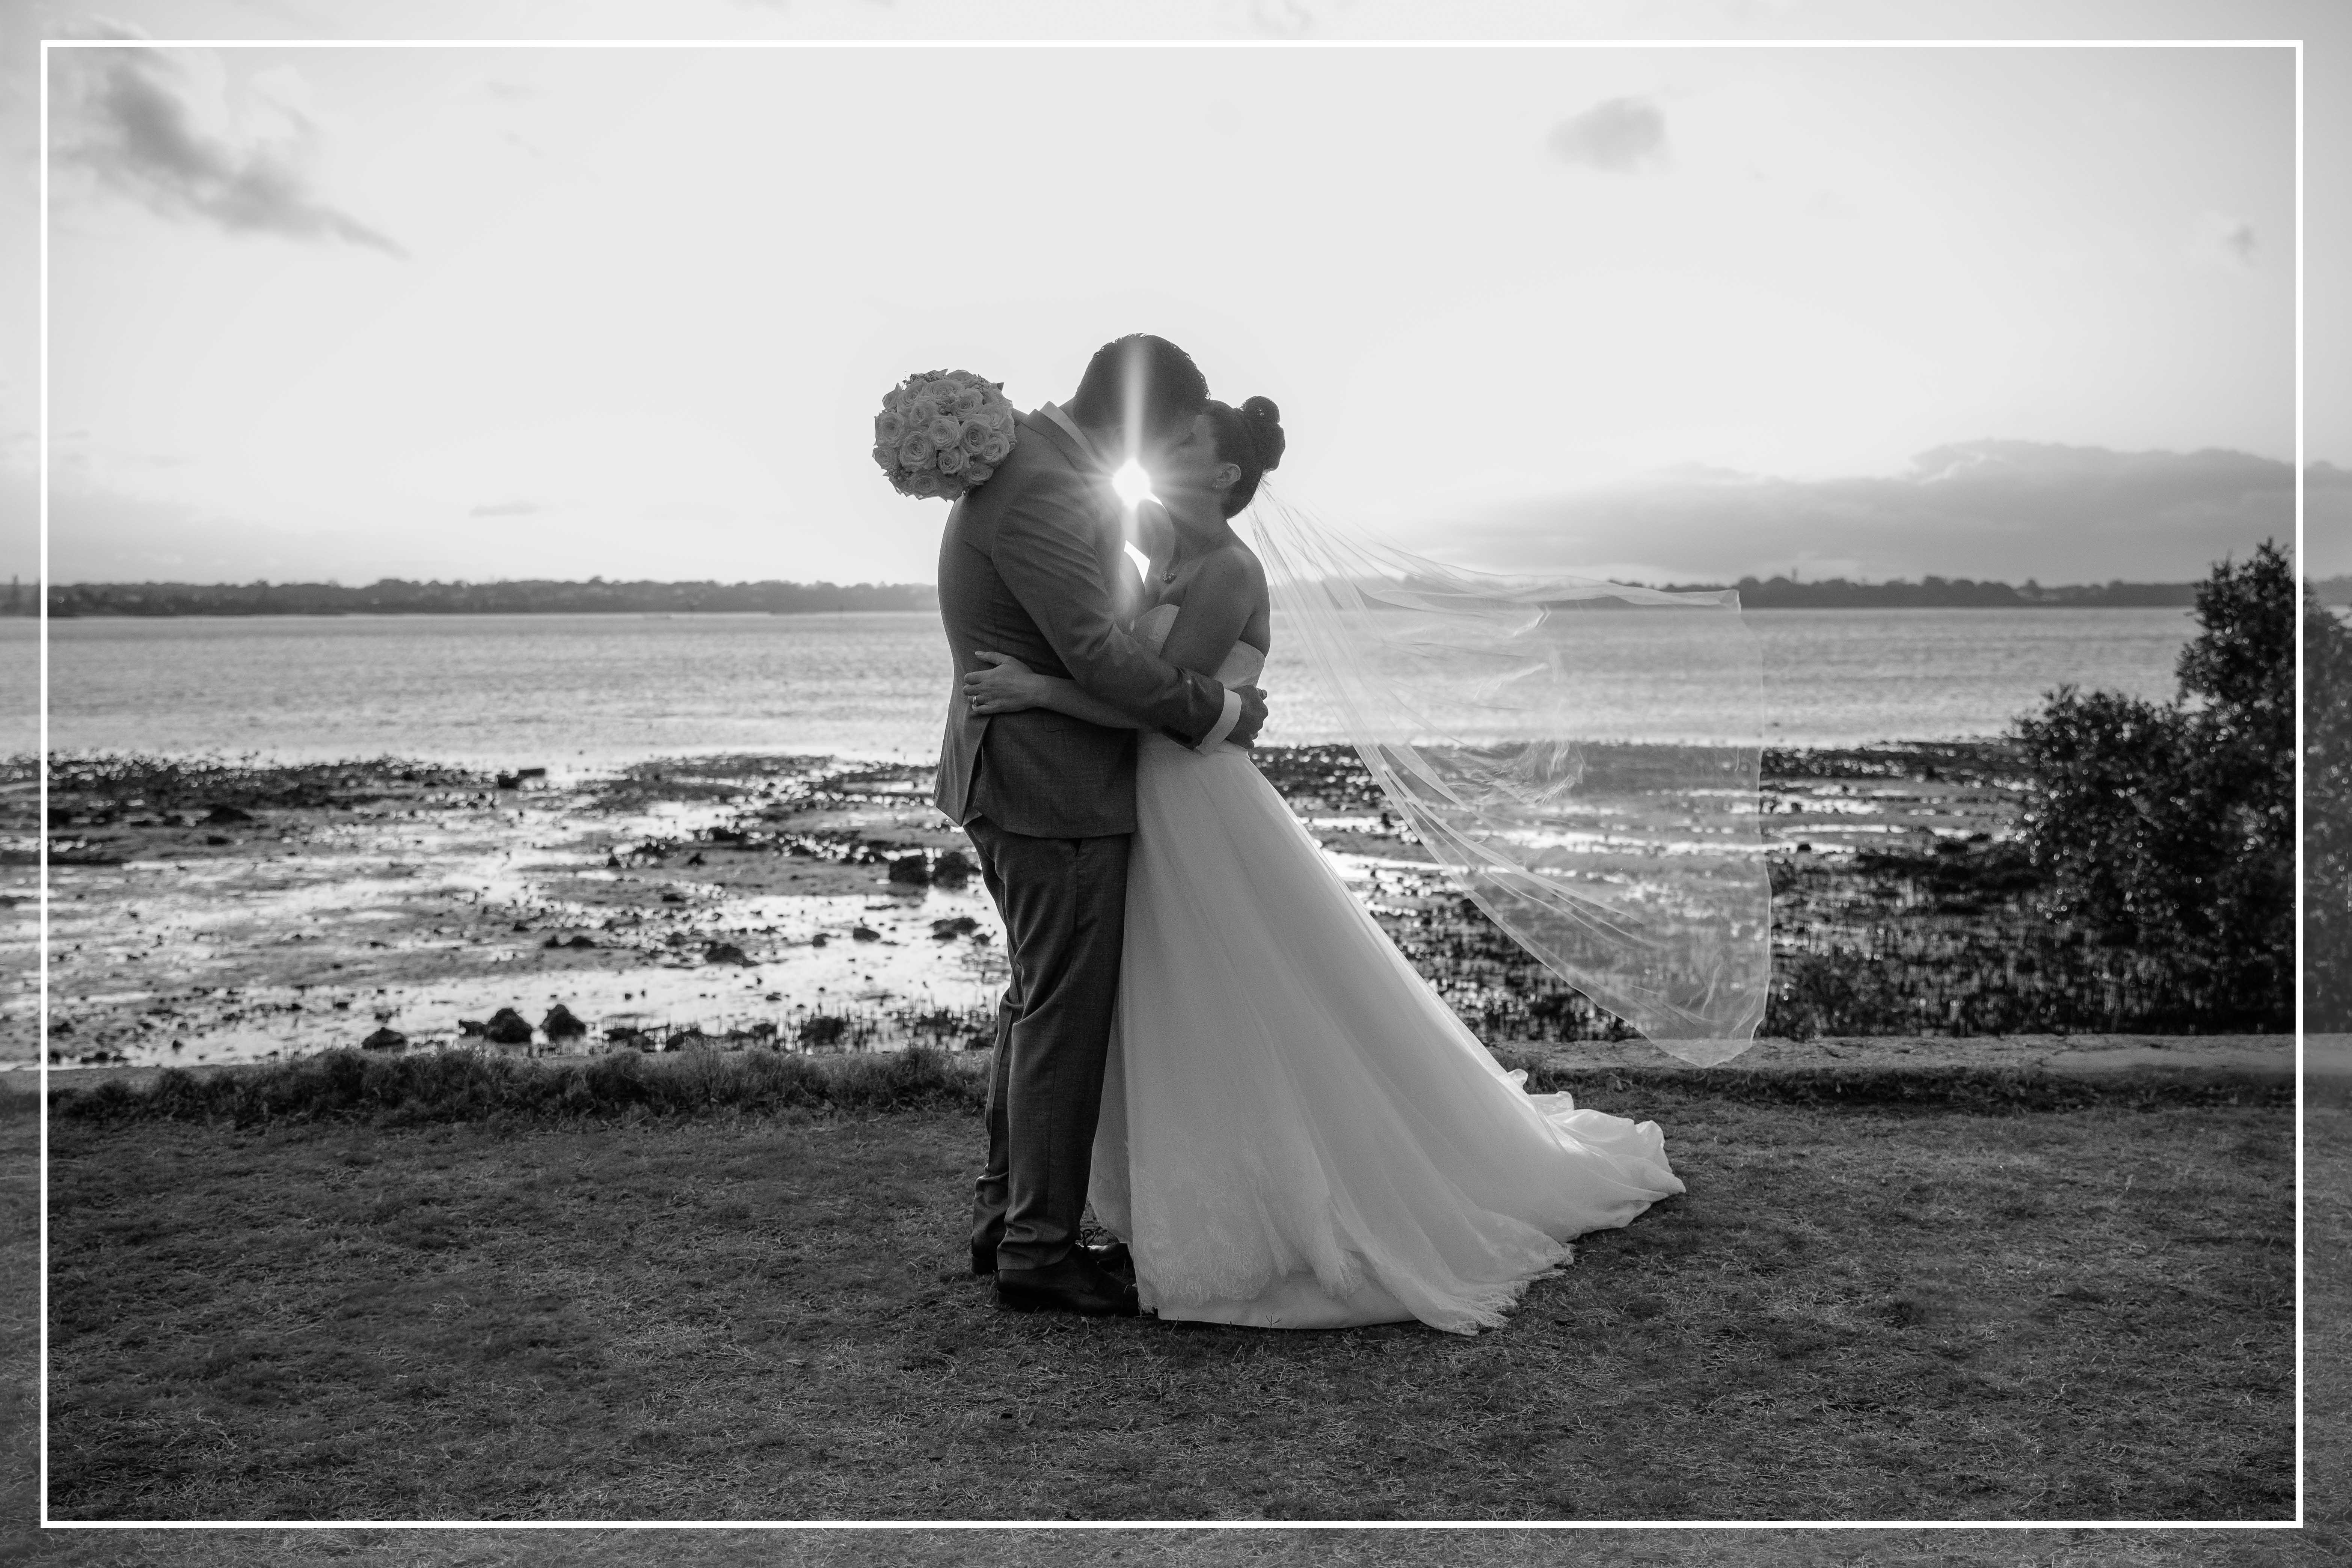 Brisbane wedding, Brisbane wedding photographer, wedding photos Brisbane, wedding photography Brisbane, wedding photographer Brisbane, Brisbane photographer, best wedding photographer